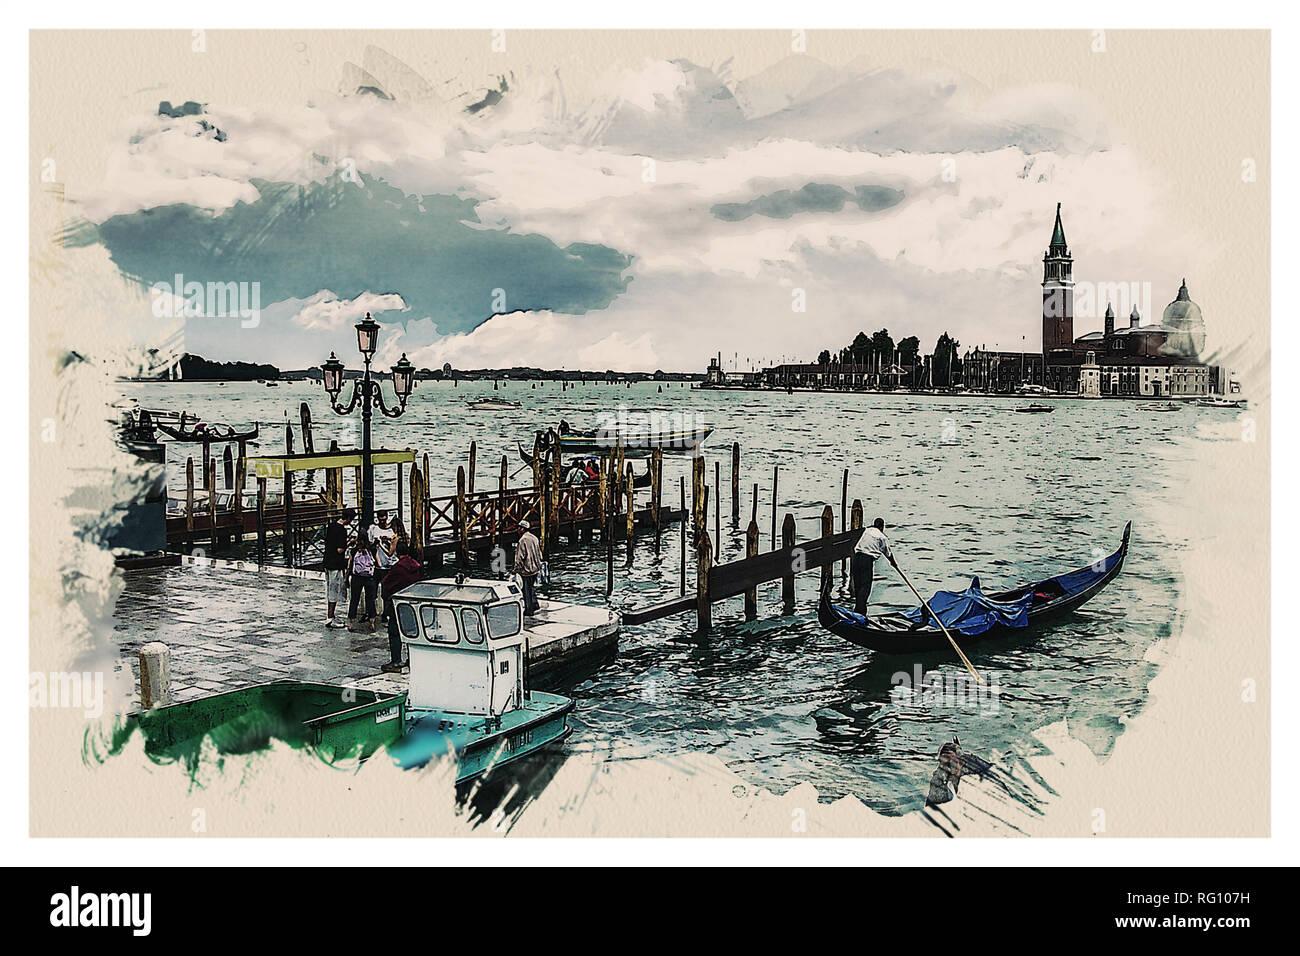 Wonders of the Worlds - Venice Gondola Water Venezia Europe.jpg - RG107H 1RG107H - Stock Image